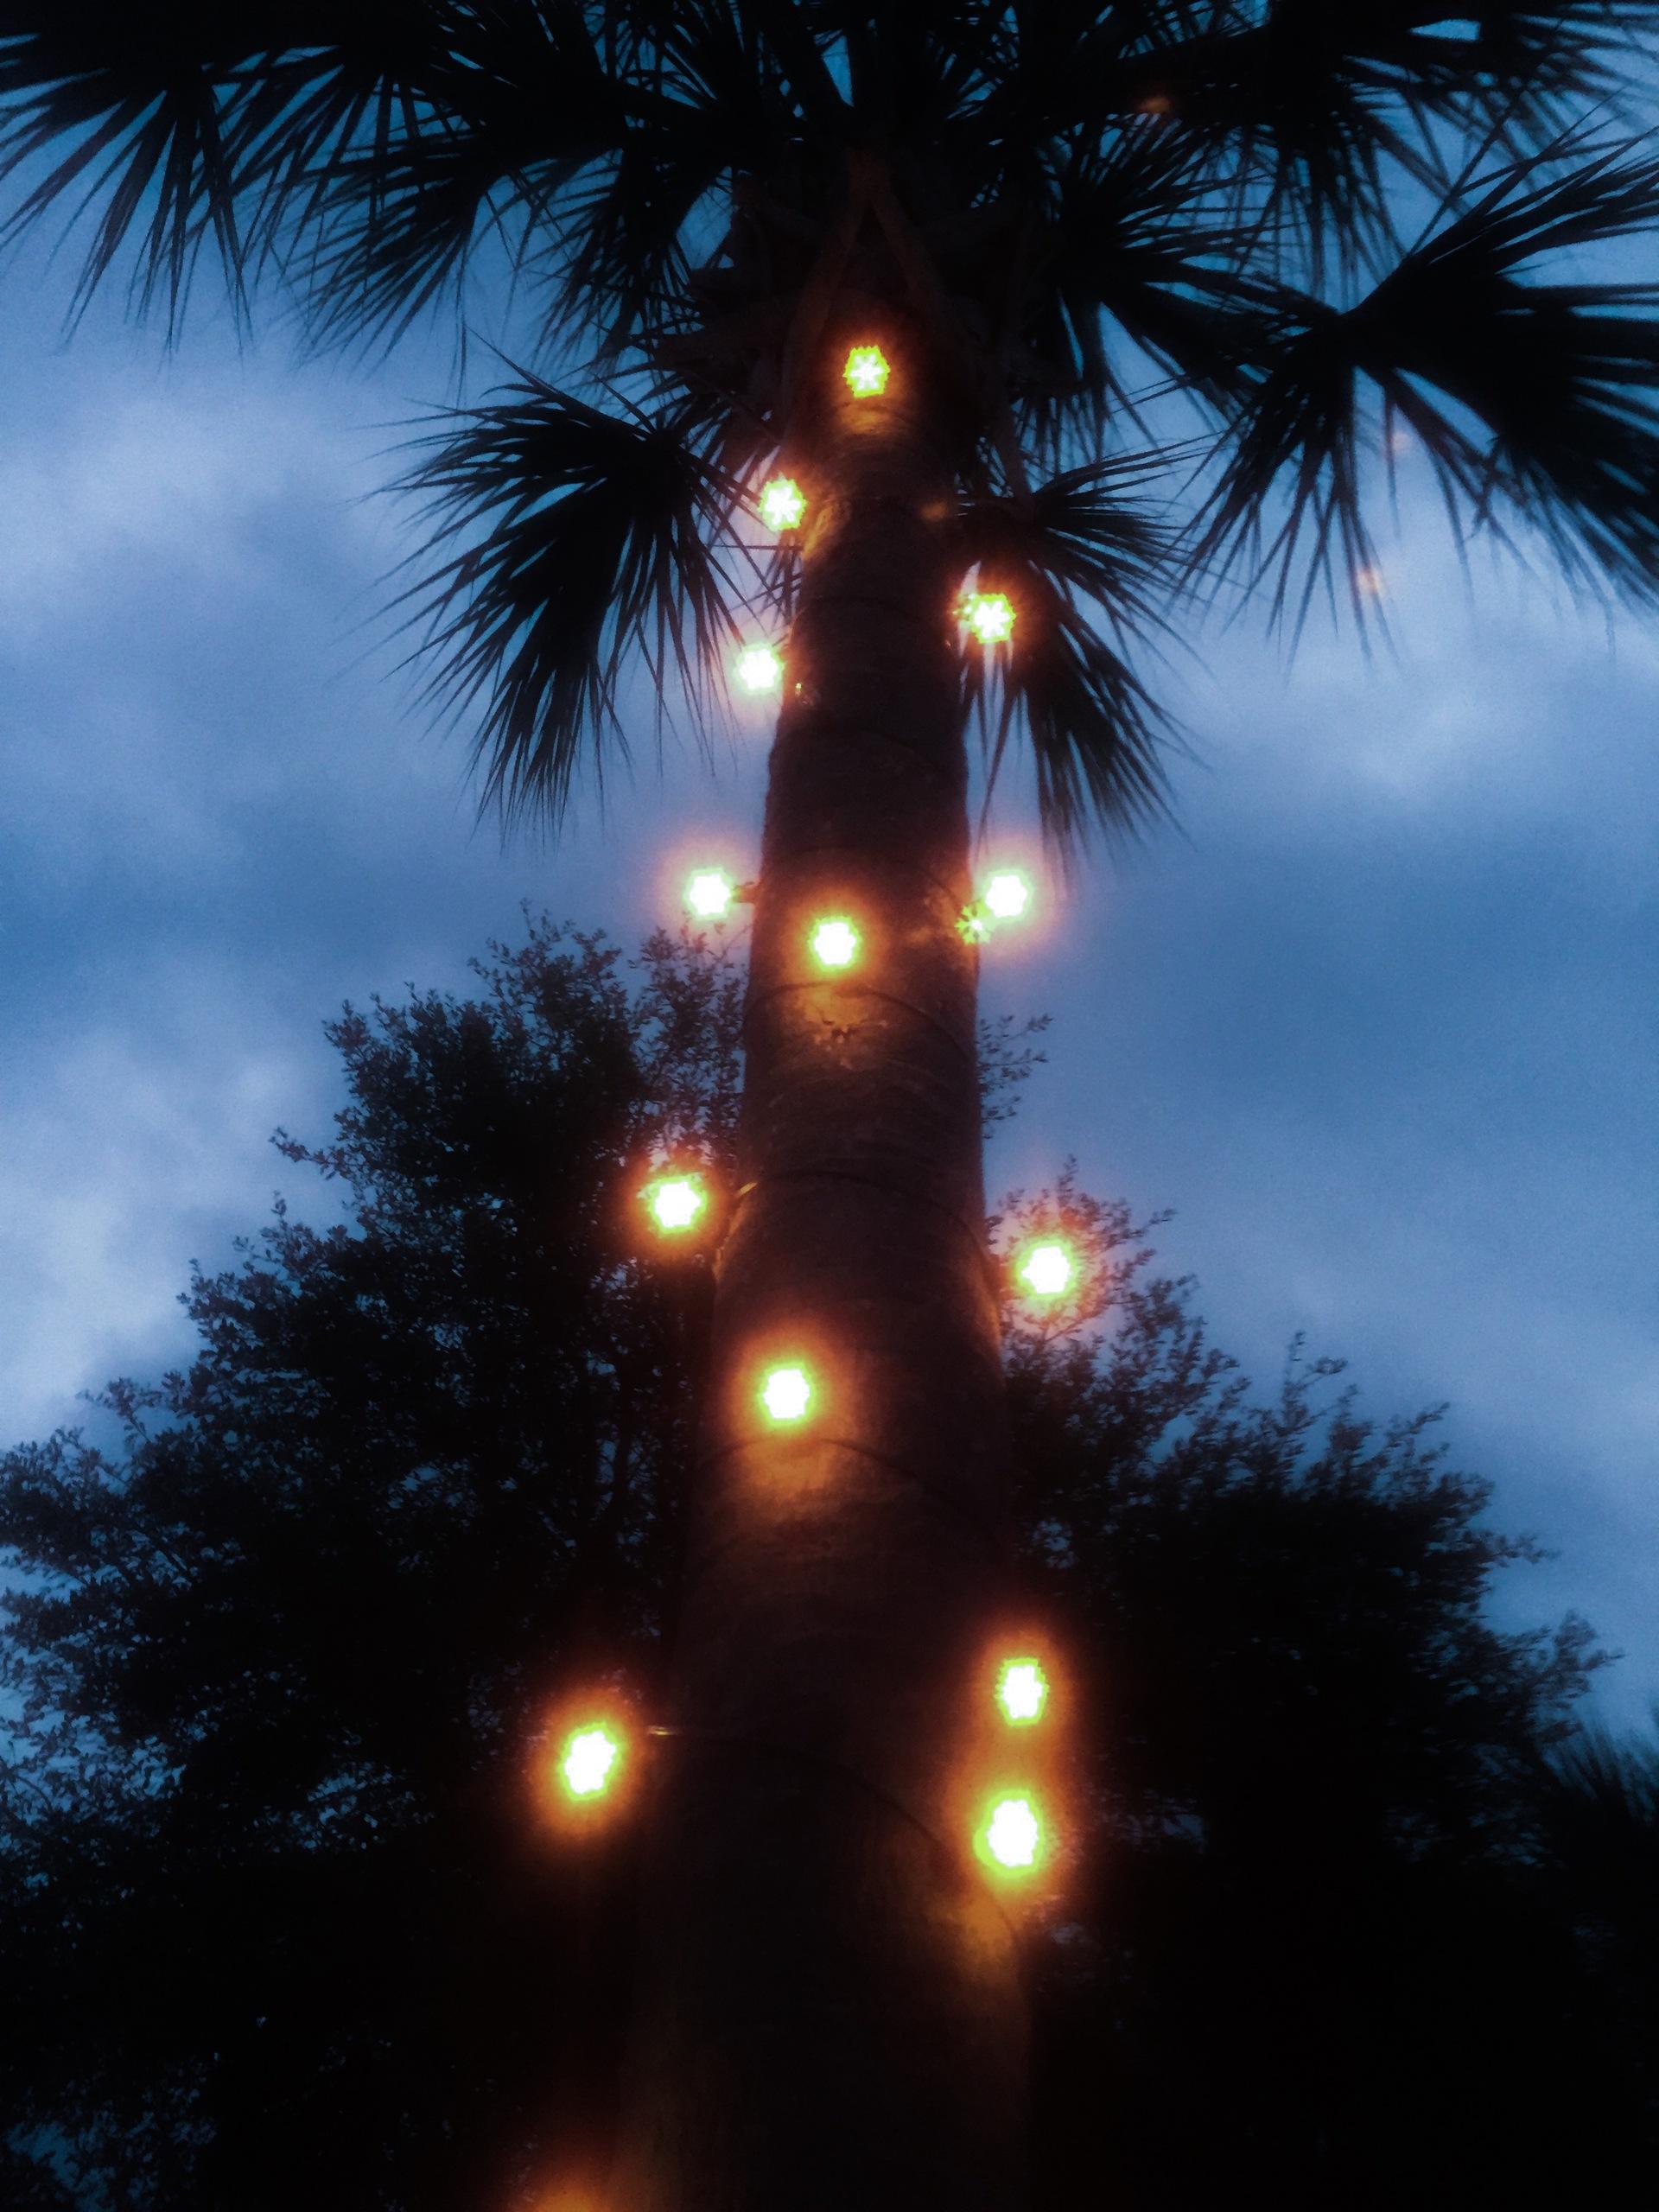 Tree illuminating with light | low, garden, park, decoration